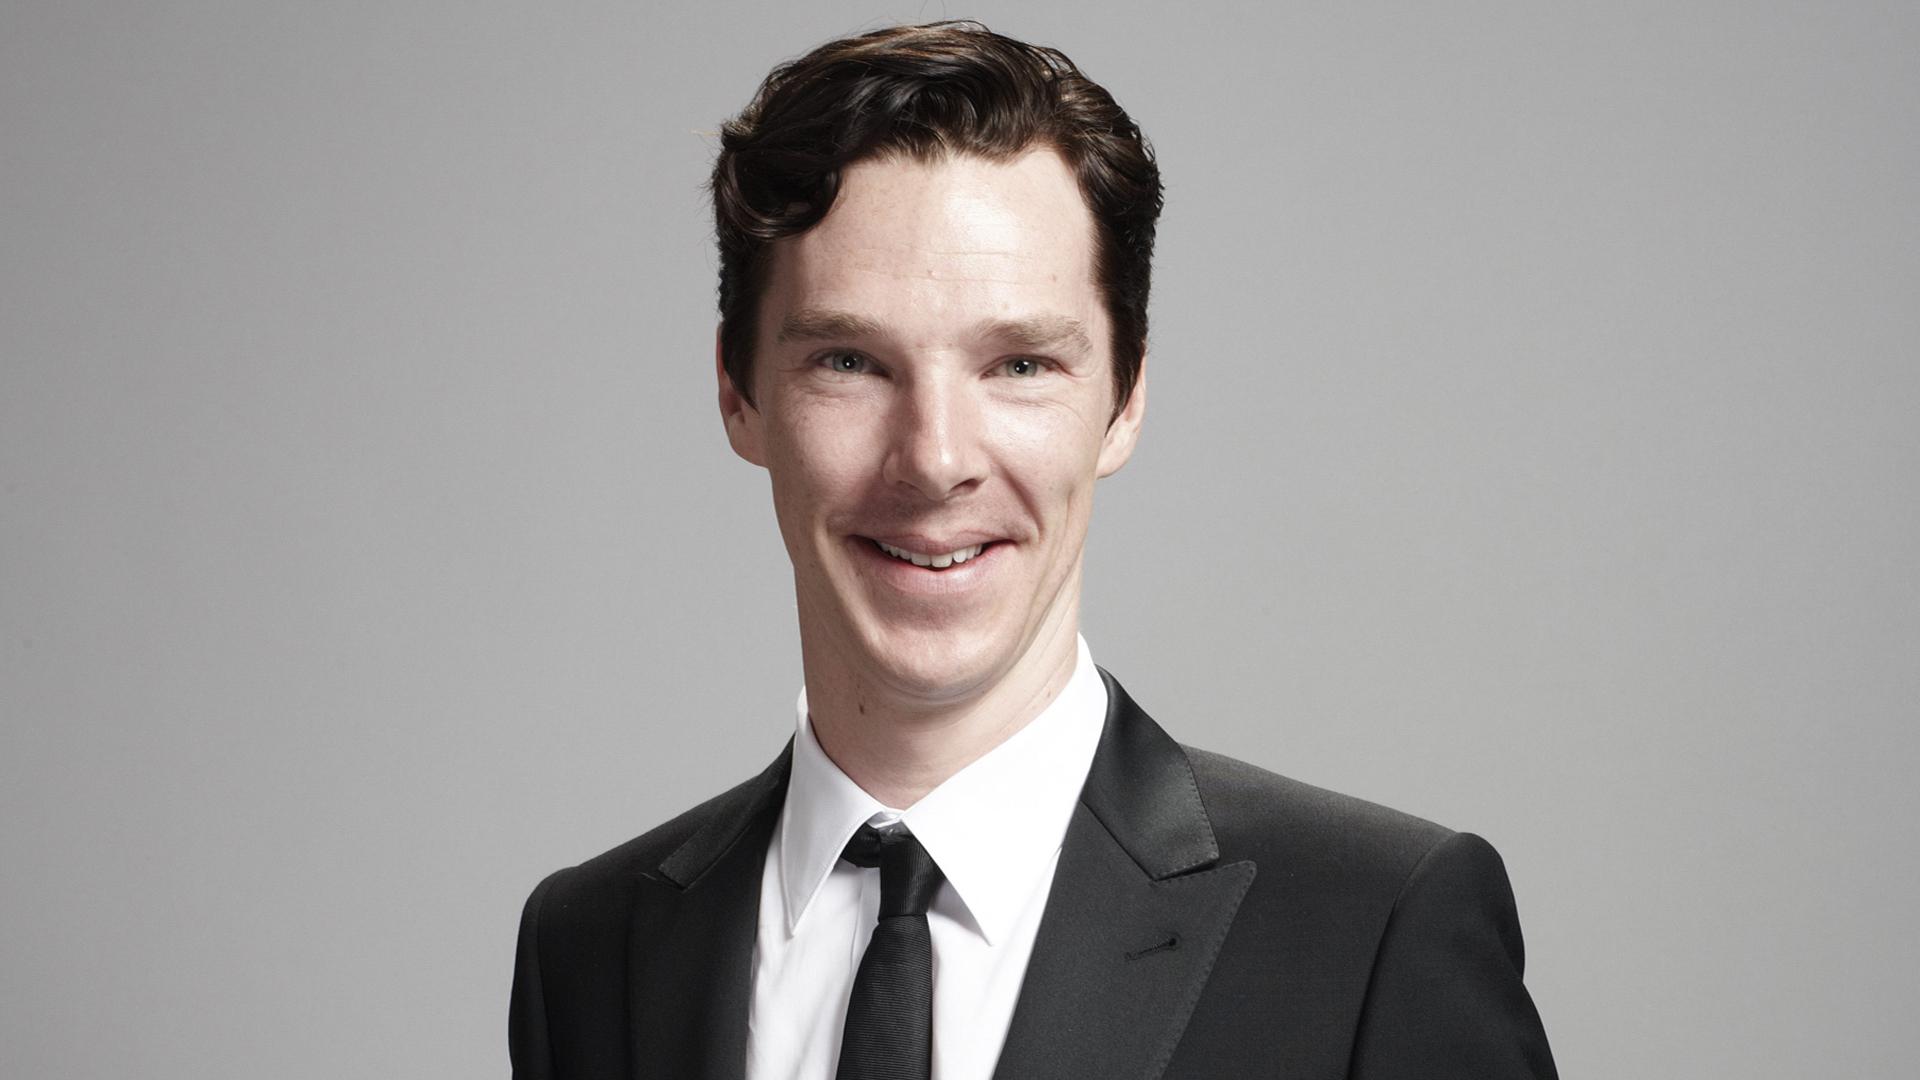 20 HD Benedict Cumberbatch Wallpapers - HDWallSource.com